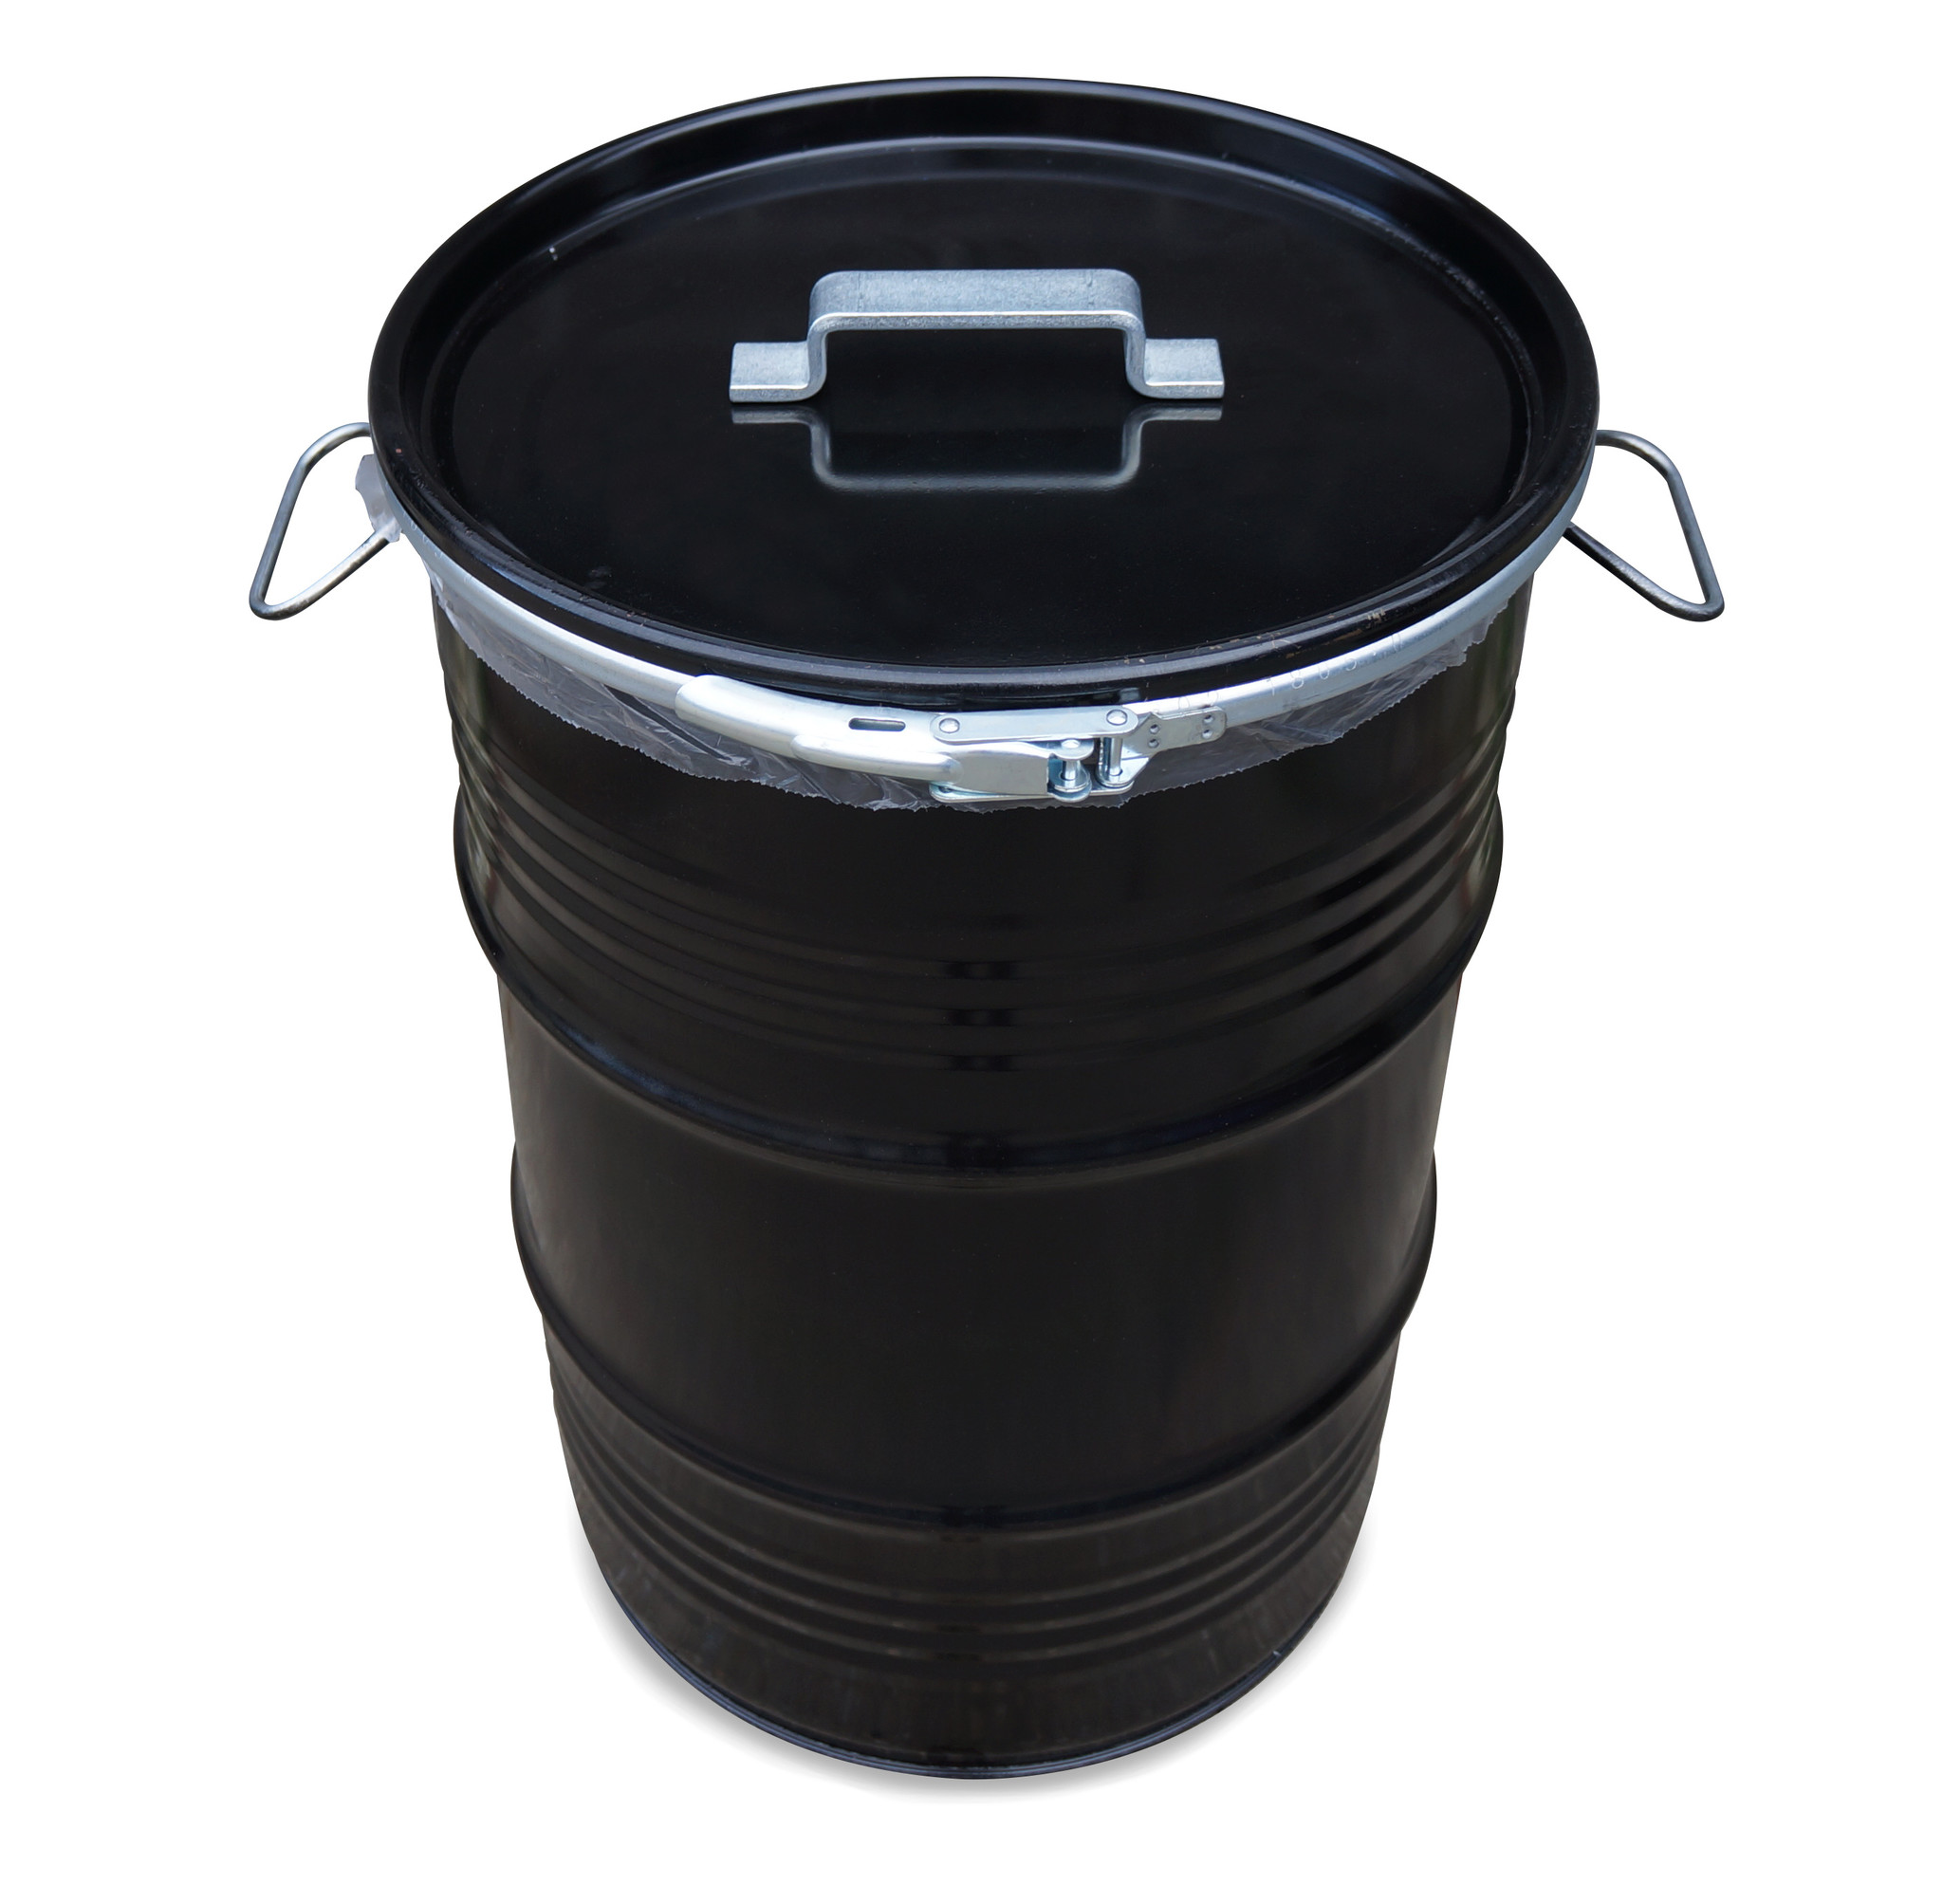 BinBin BinBin Handle industrile prullenbak zwart 60 Liter olievat met handvat deksel